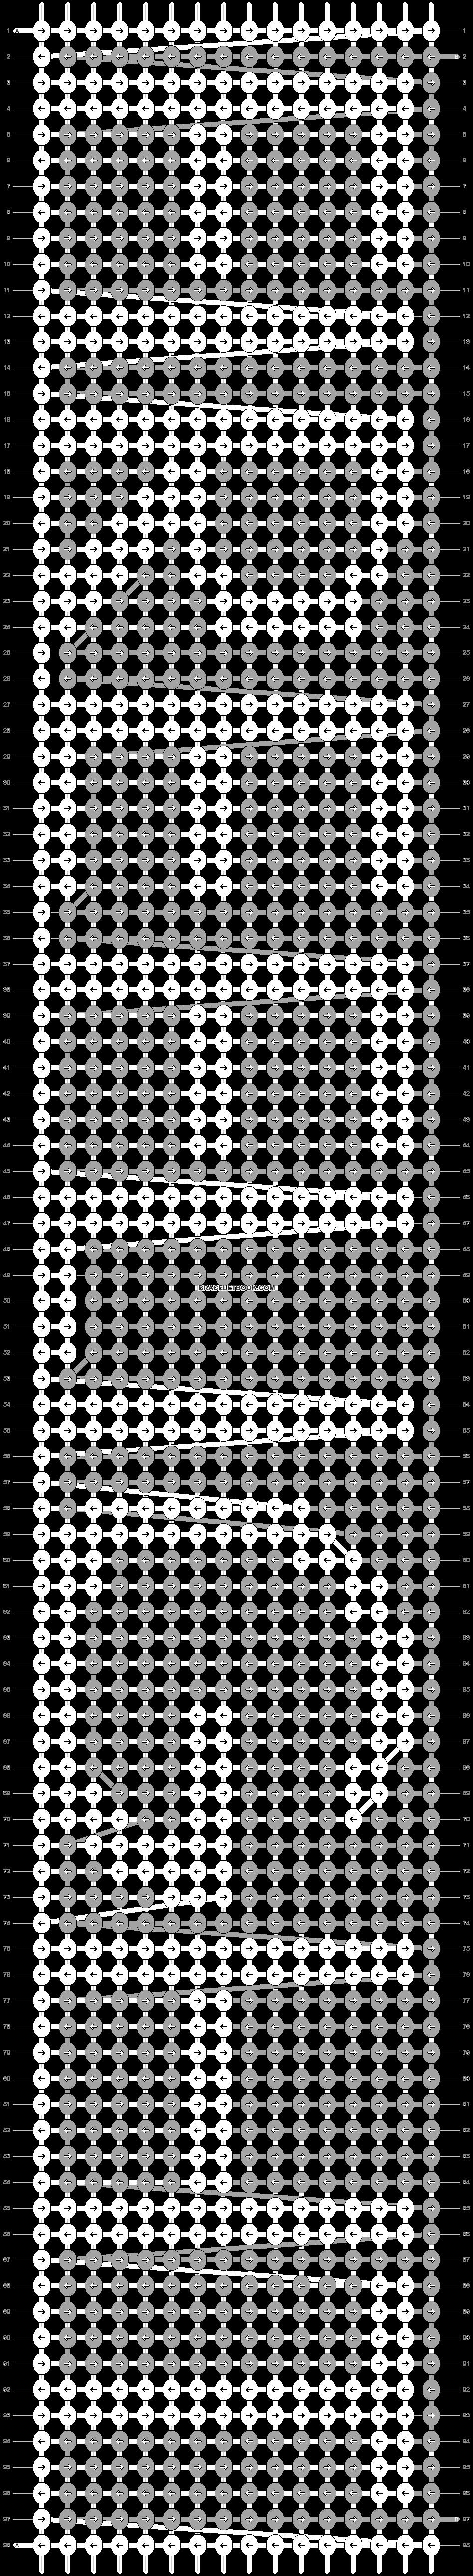 Alpha pattern #2530 pattern